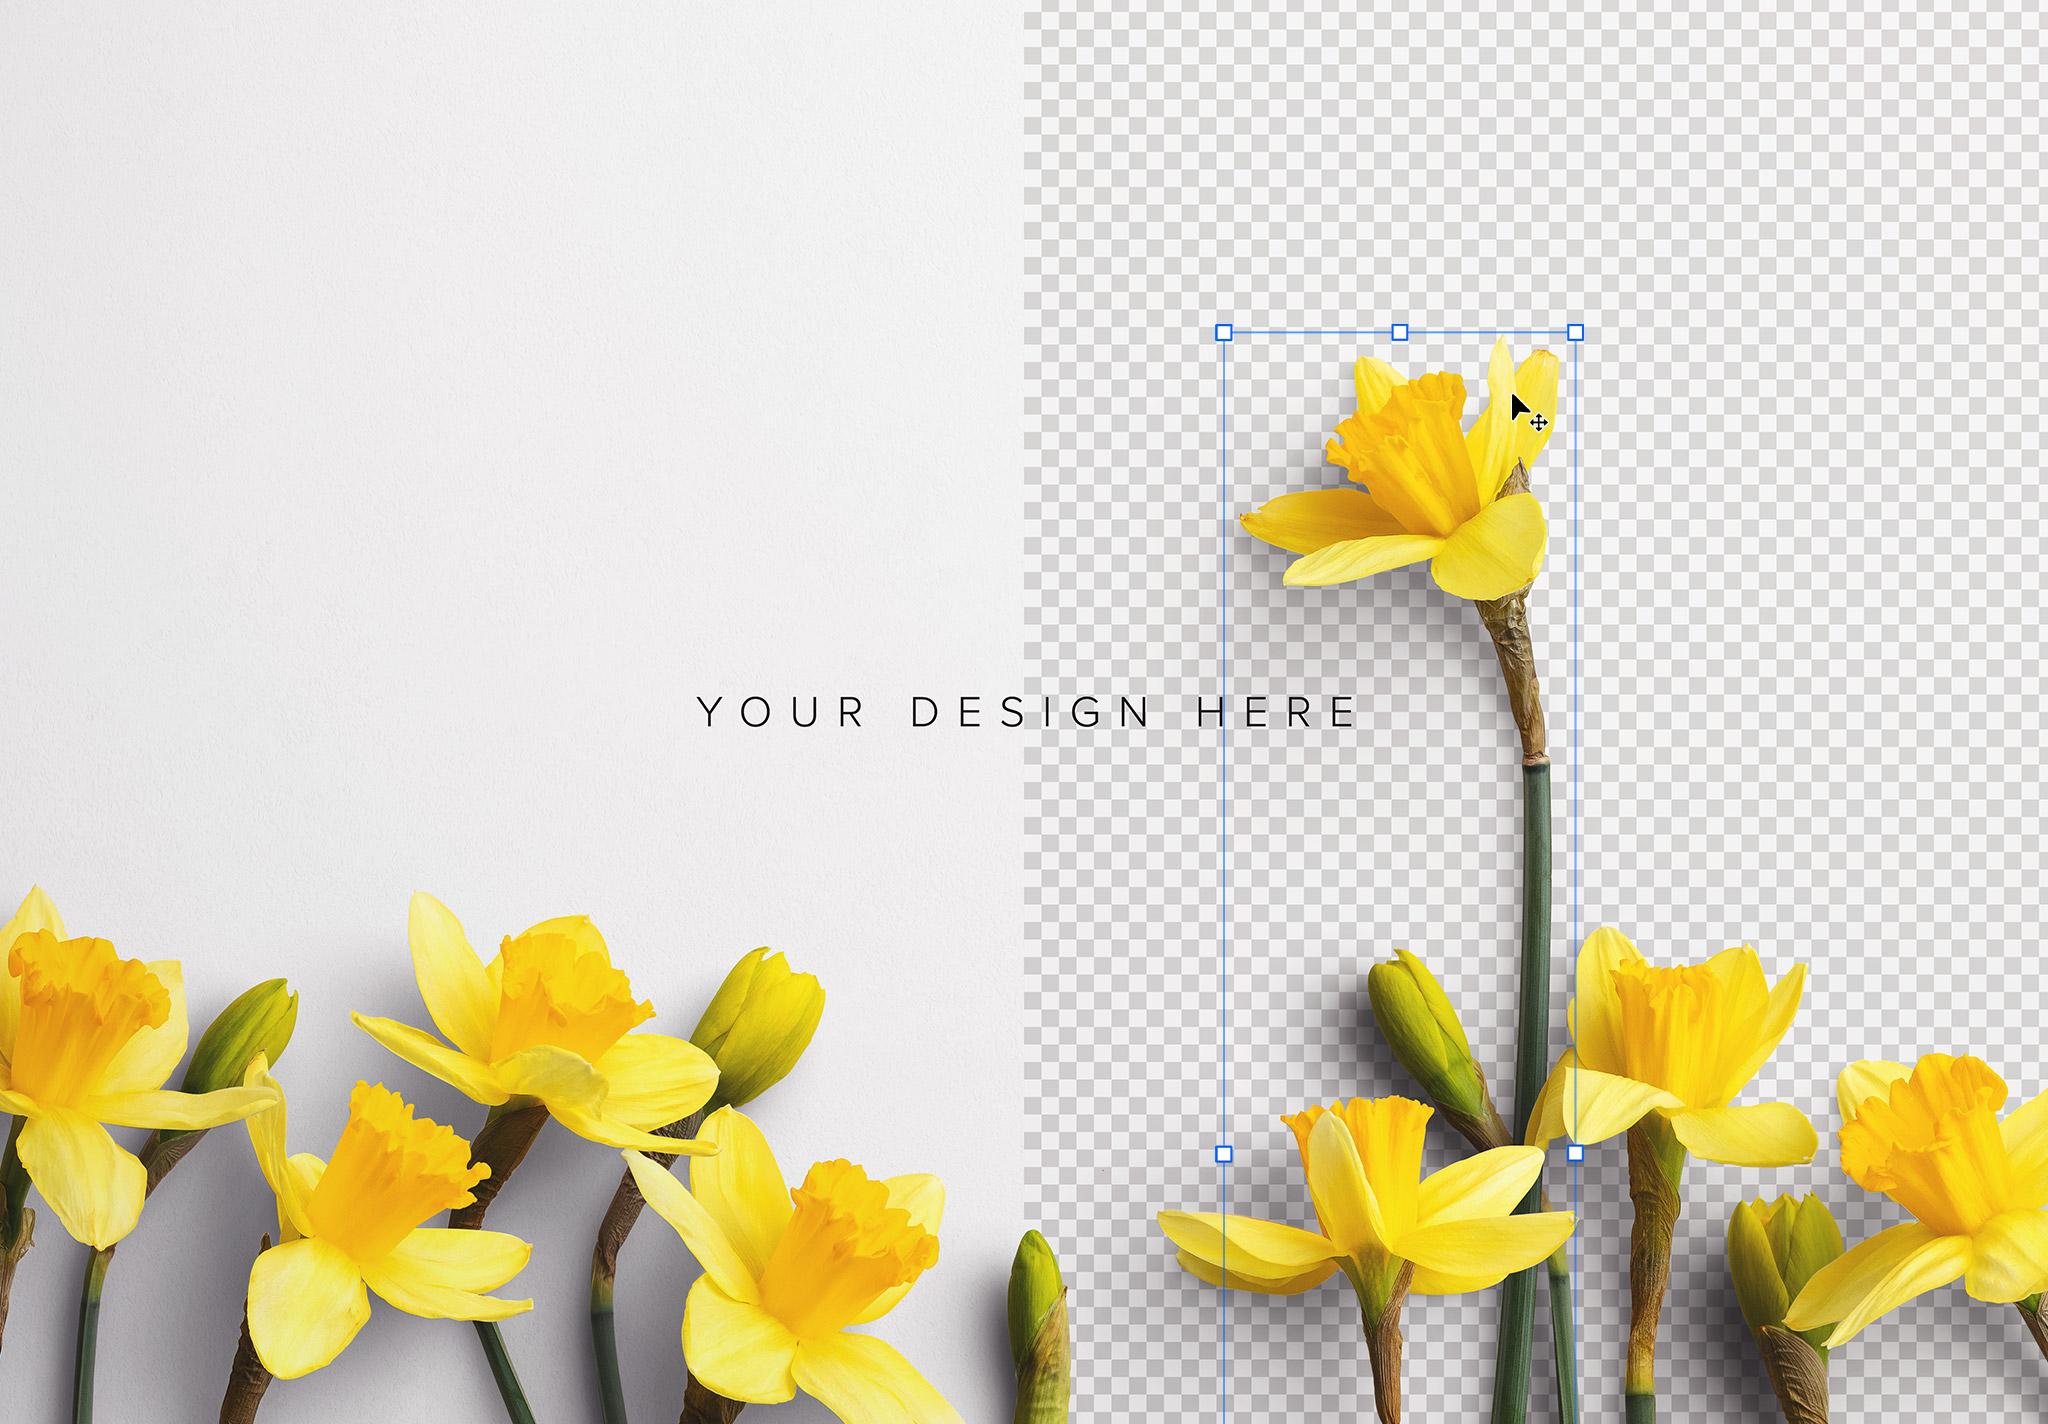 Daffodils Custom Scene Creator Template 2 Image01